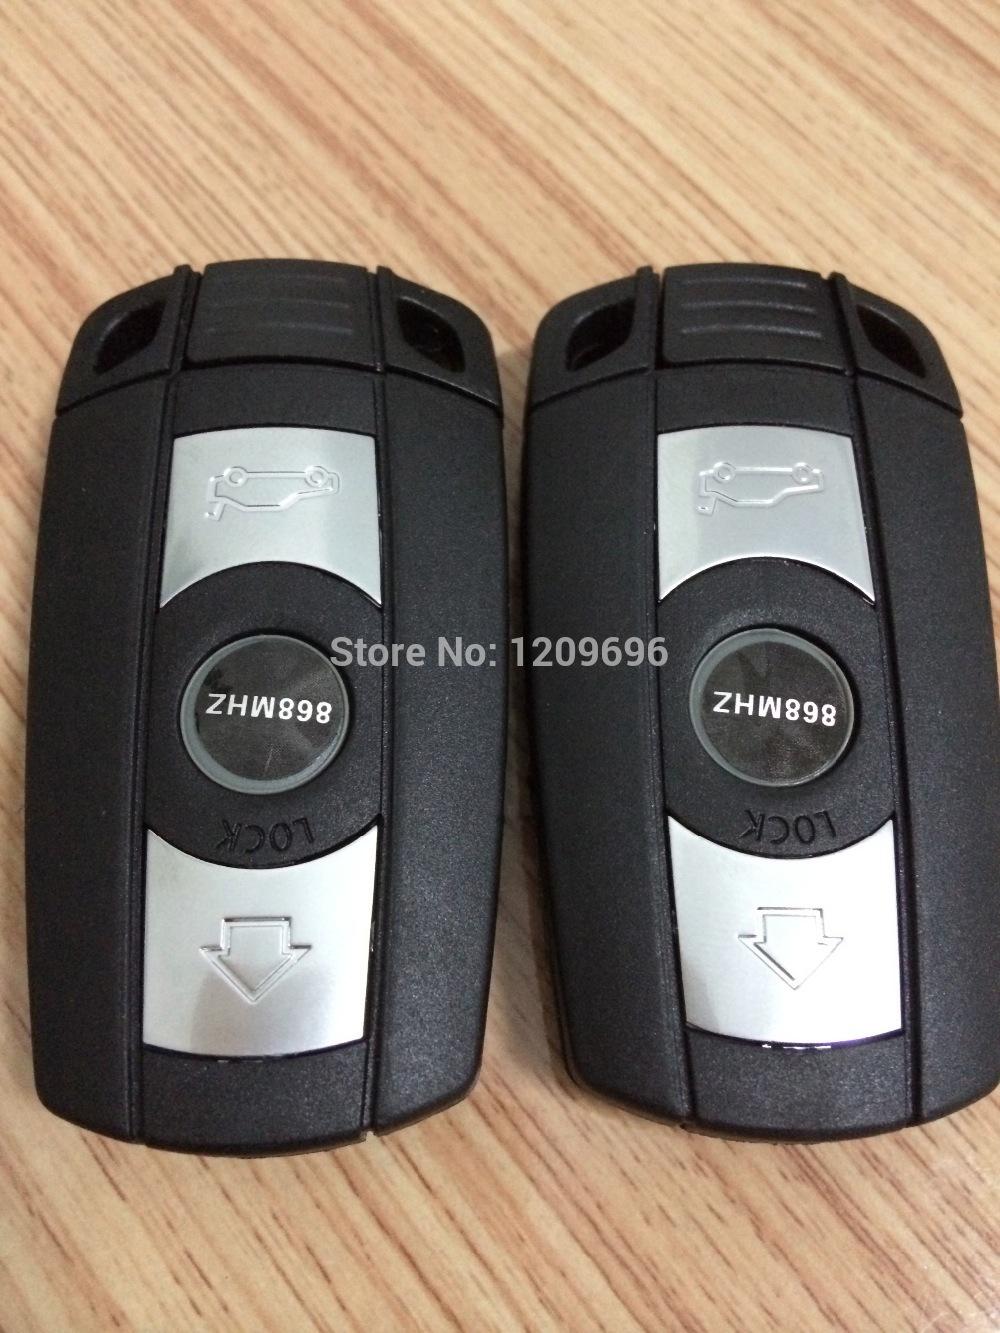 Охранная система OEM BMW 1/3/5 x 1 x 6 Z4 CAS3 PCF7941 3 868 /433/315 электрический скутер eglobal oem 1 x 3 v s1